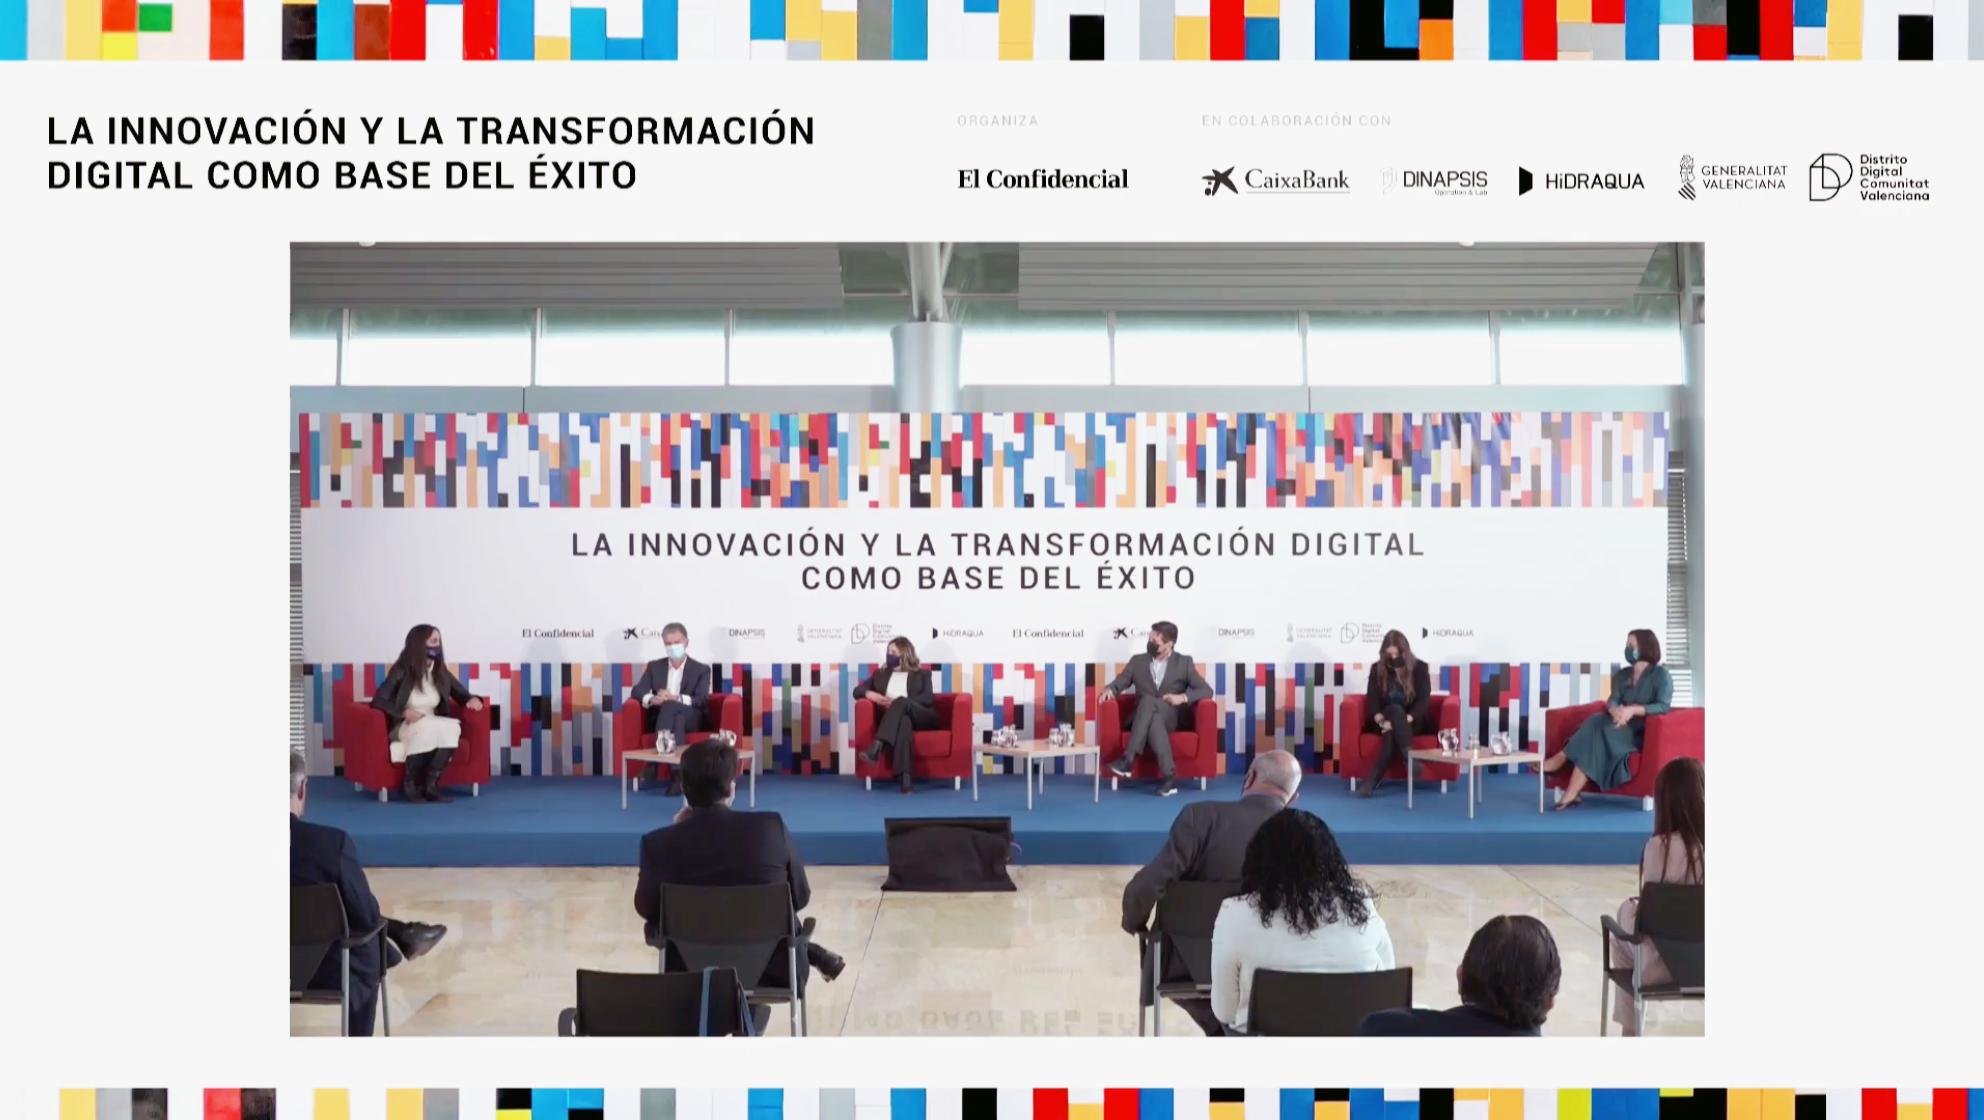 foro_innovacion_transformacion_digital_base_exito